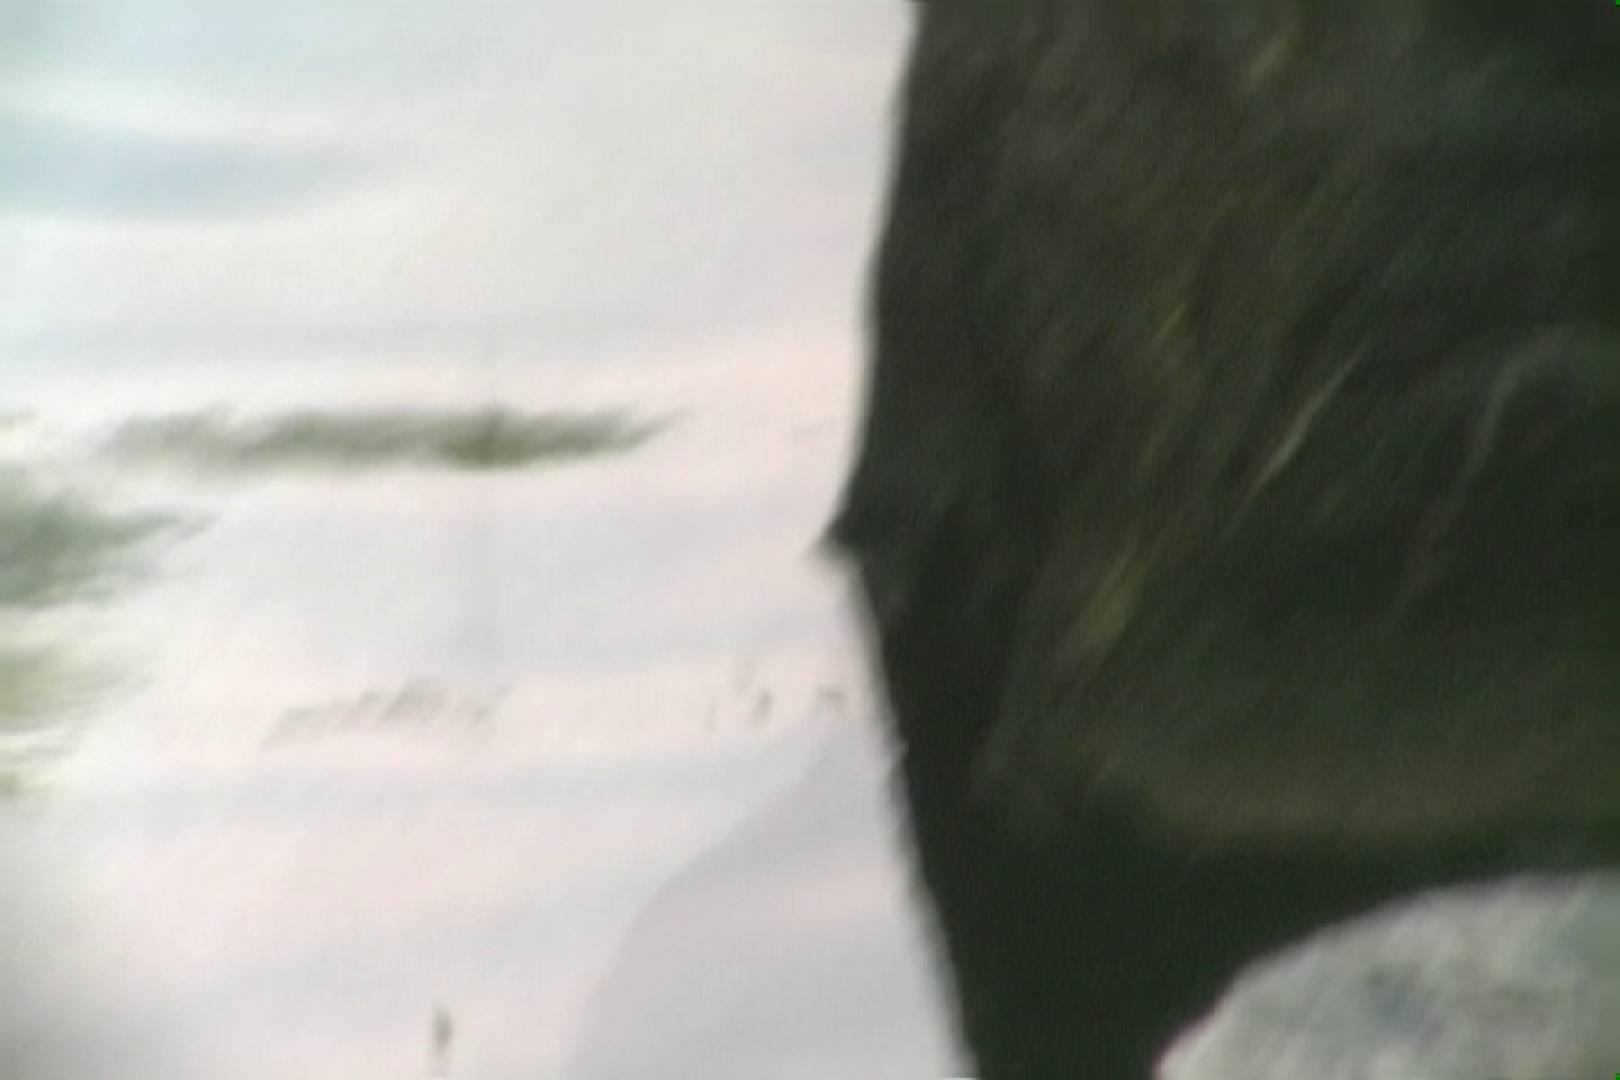 Aquaな露天風呂Vol.614 露天風呂突入 AV無料動画キャプチャ 79pic 11